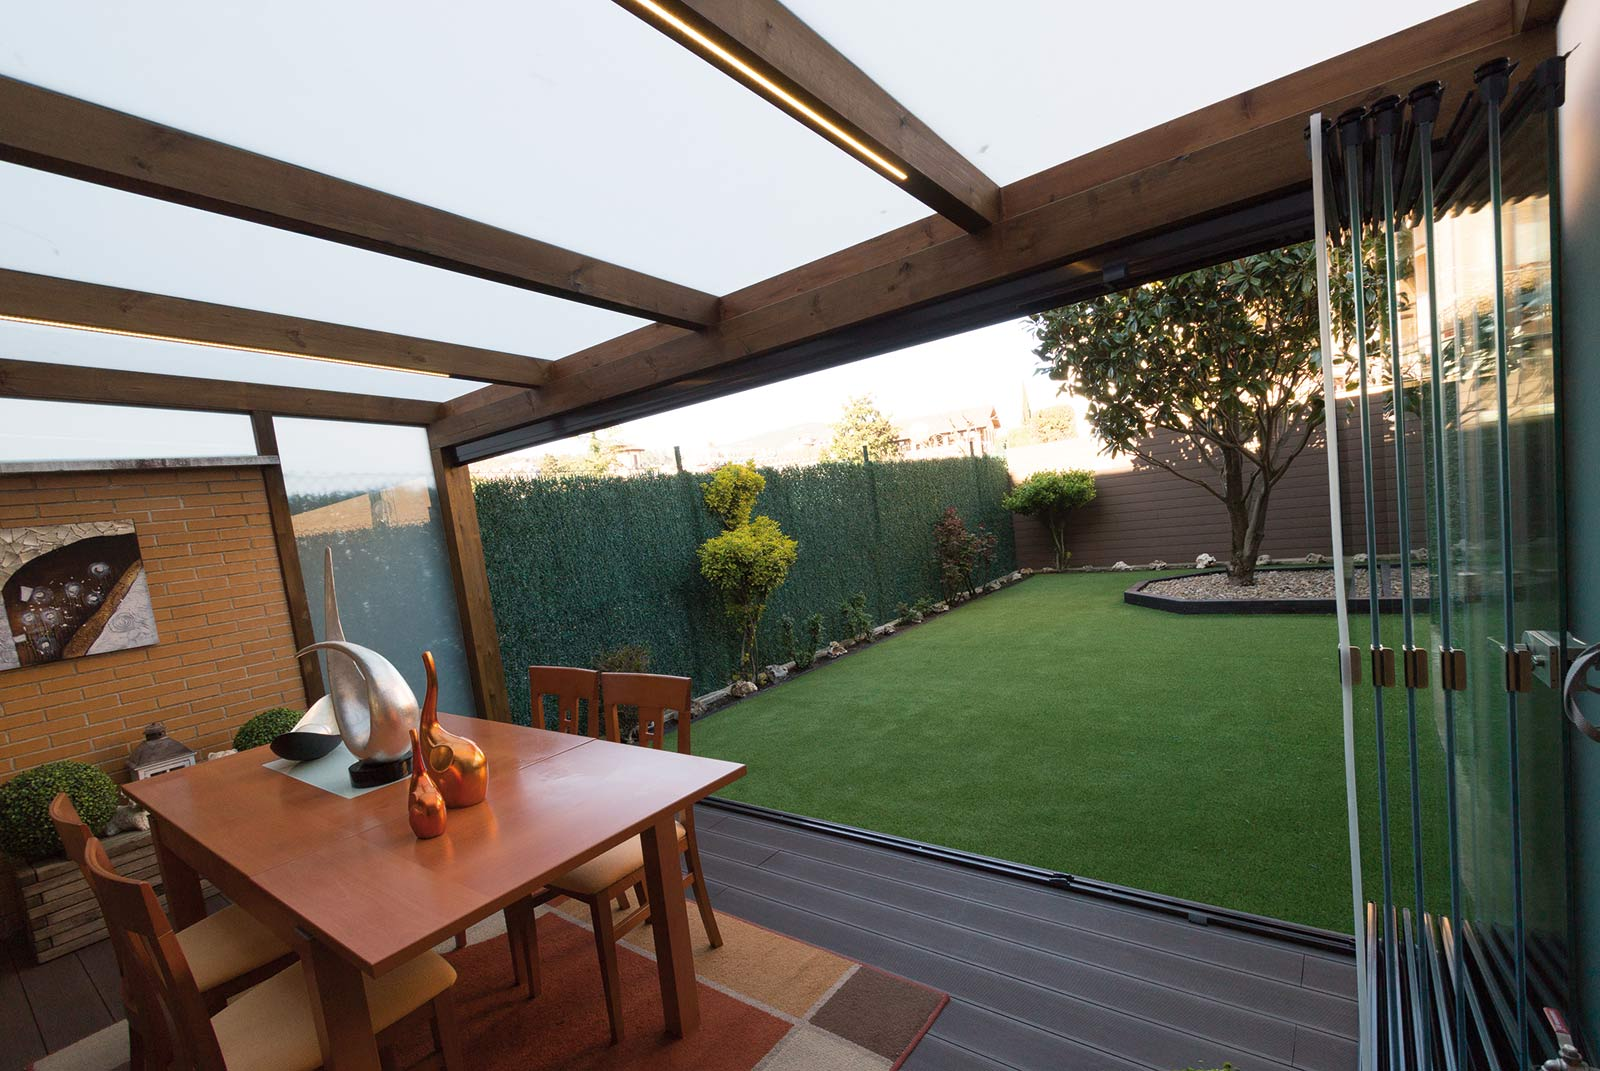 porche-madera-cristal-jardin-unifamiliar-12